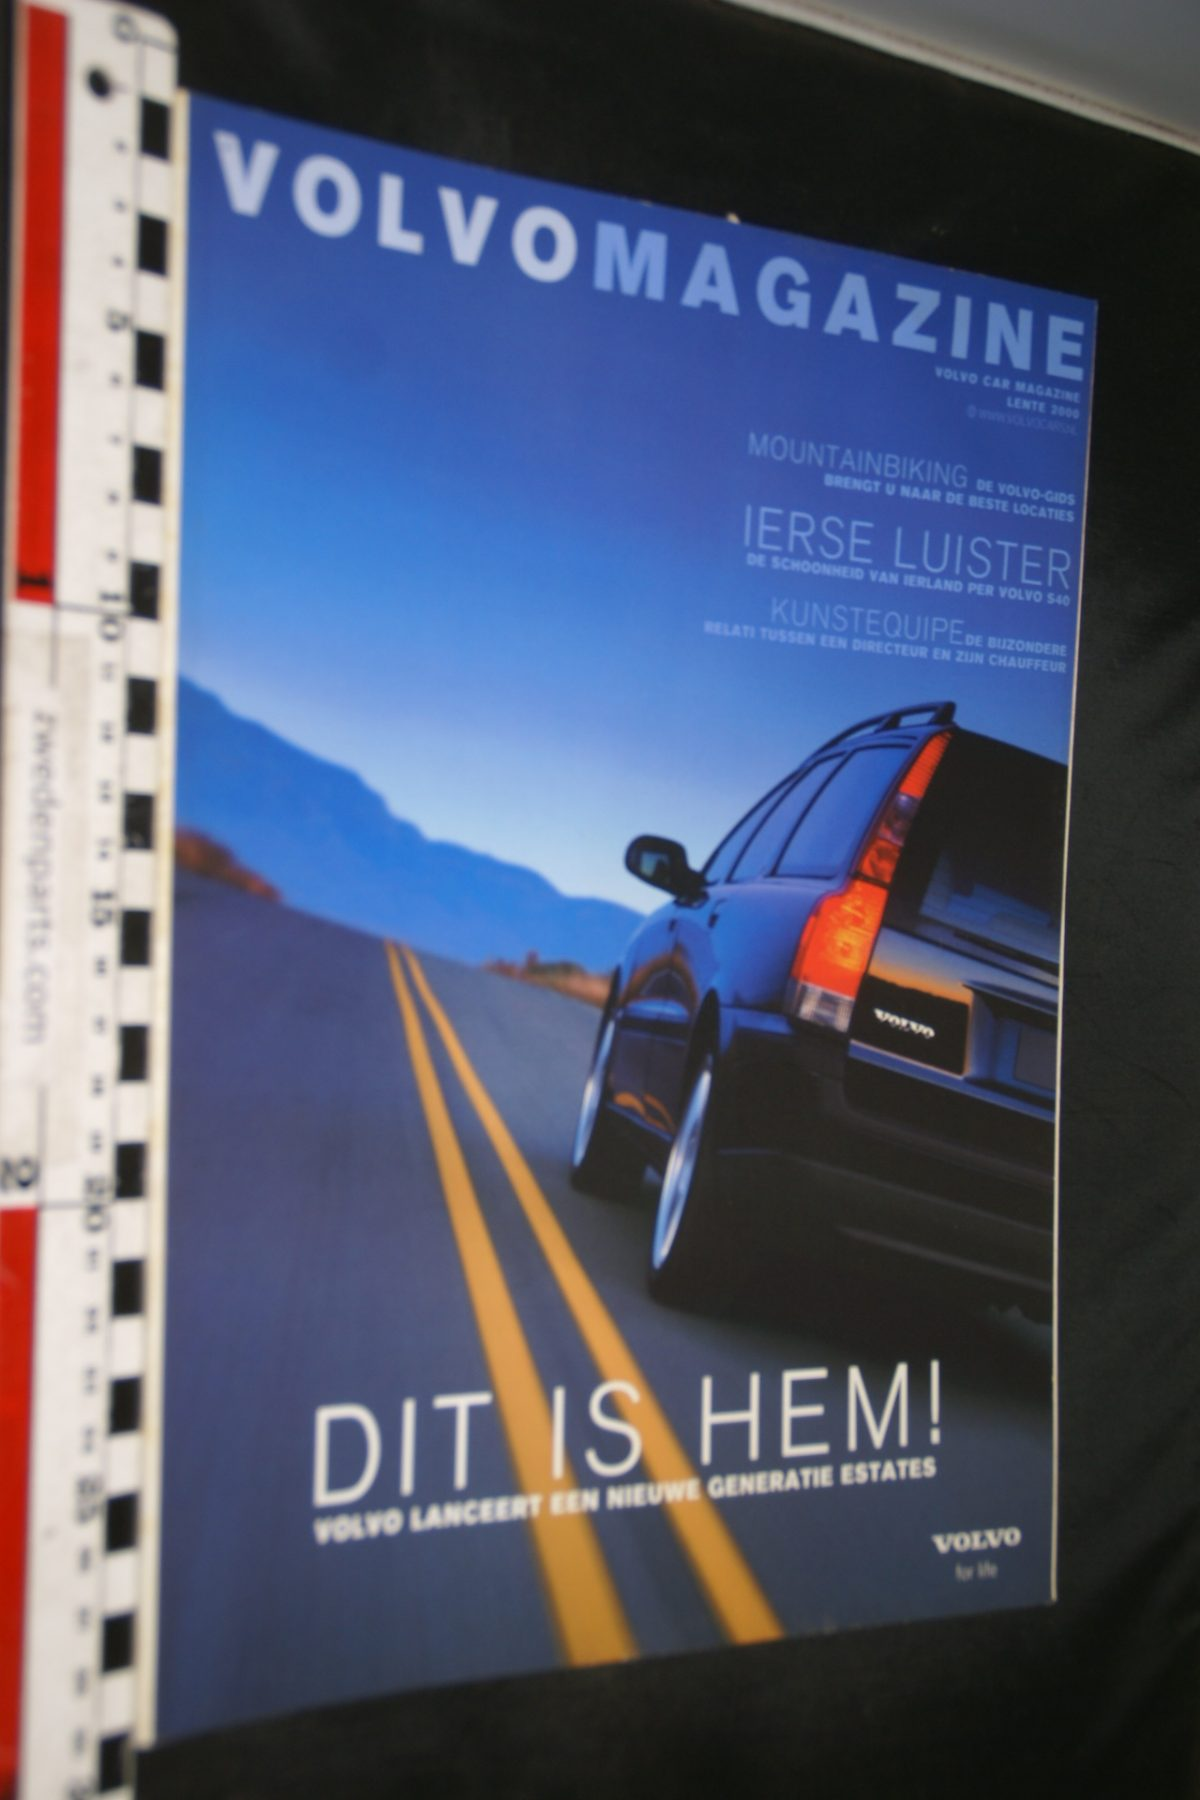 DSC04212 2000 lente tijdschrift Volvomagazine de nieuwe estates